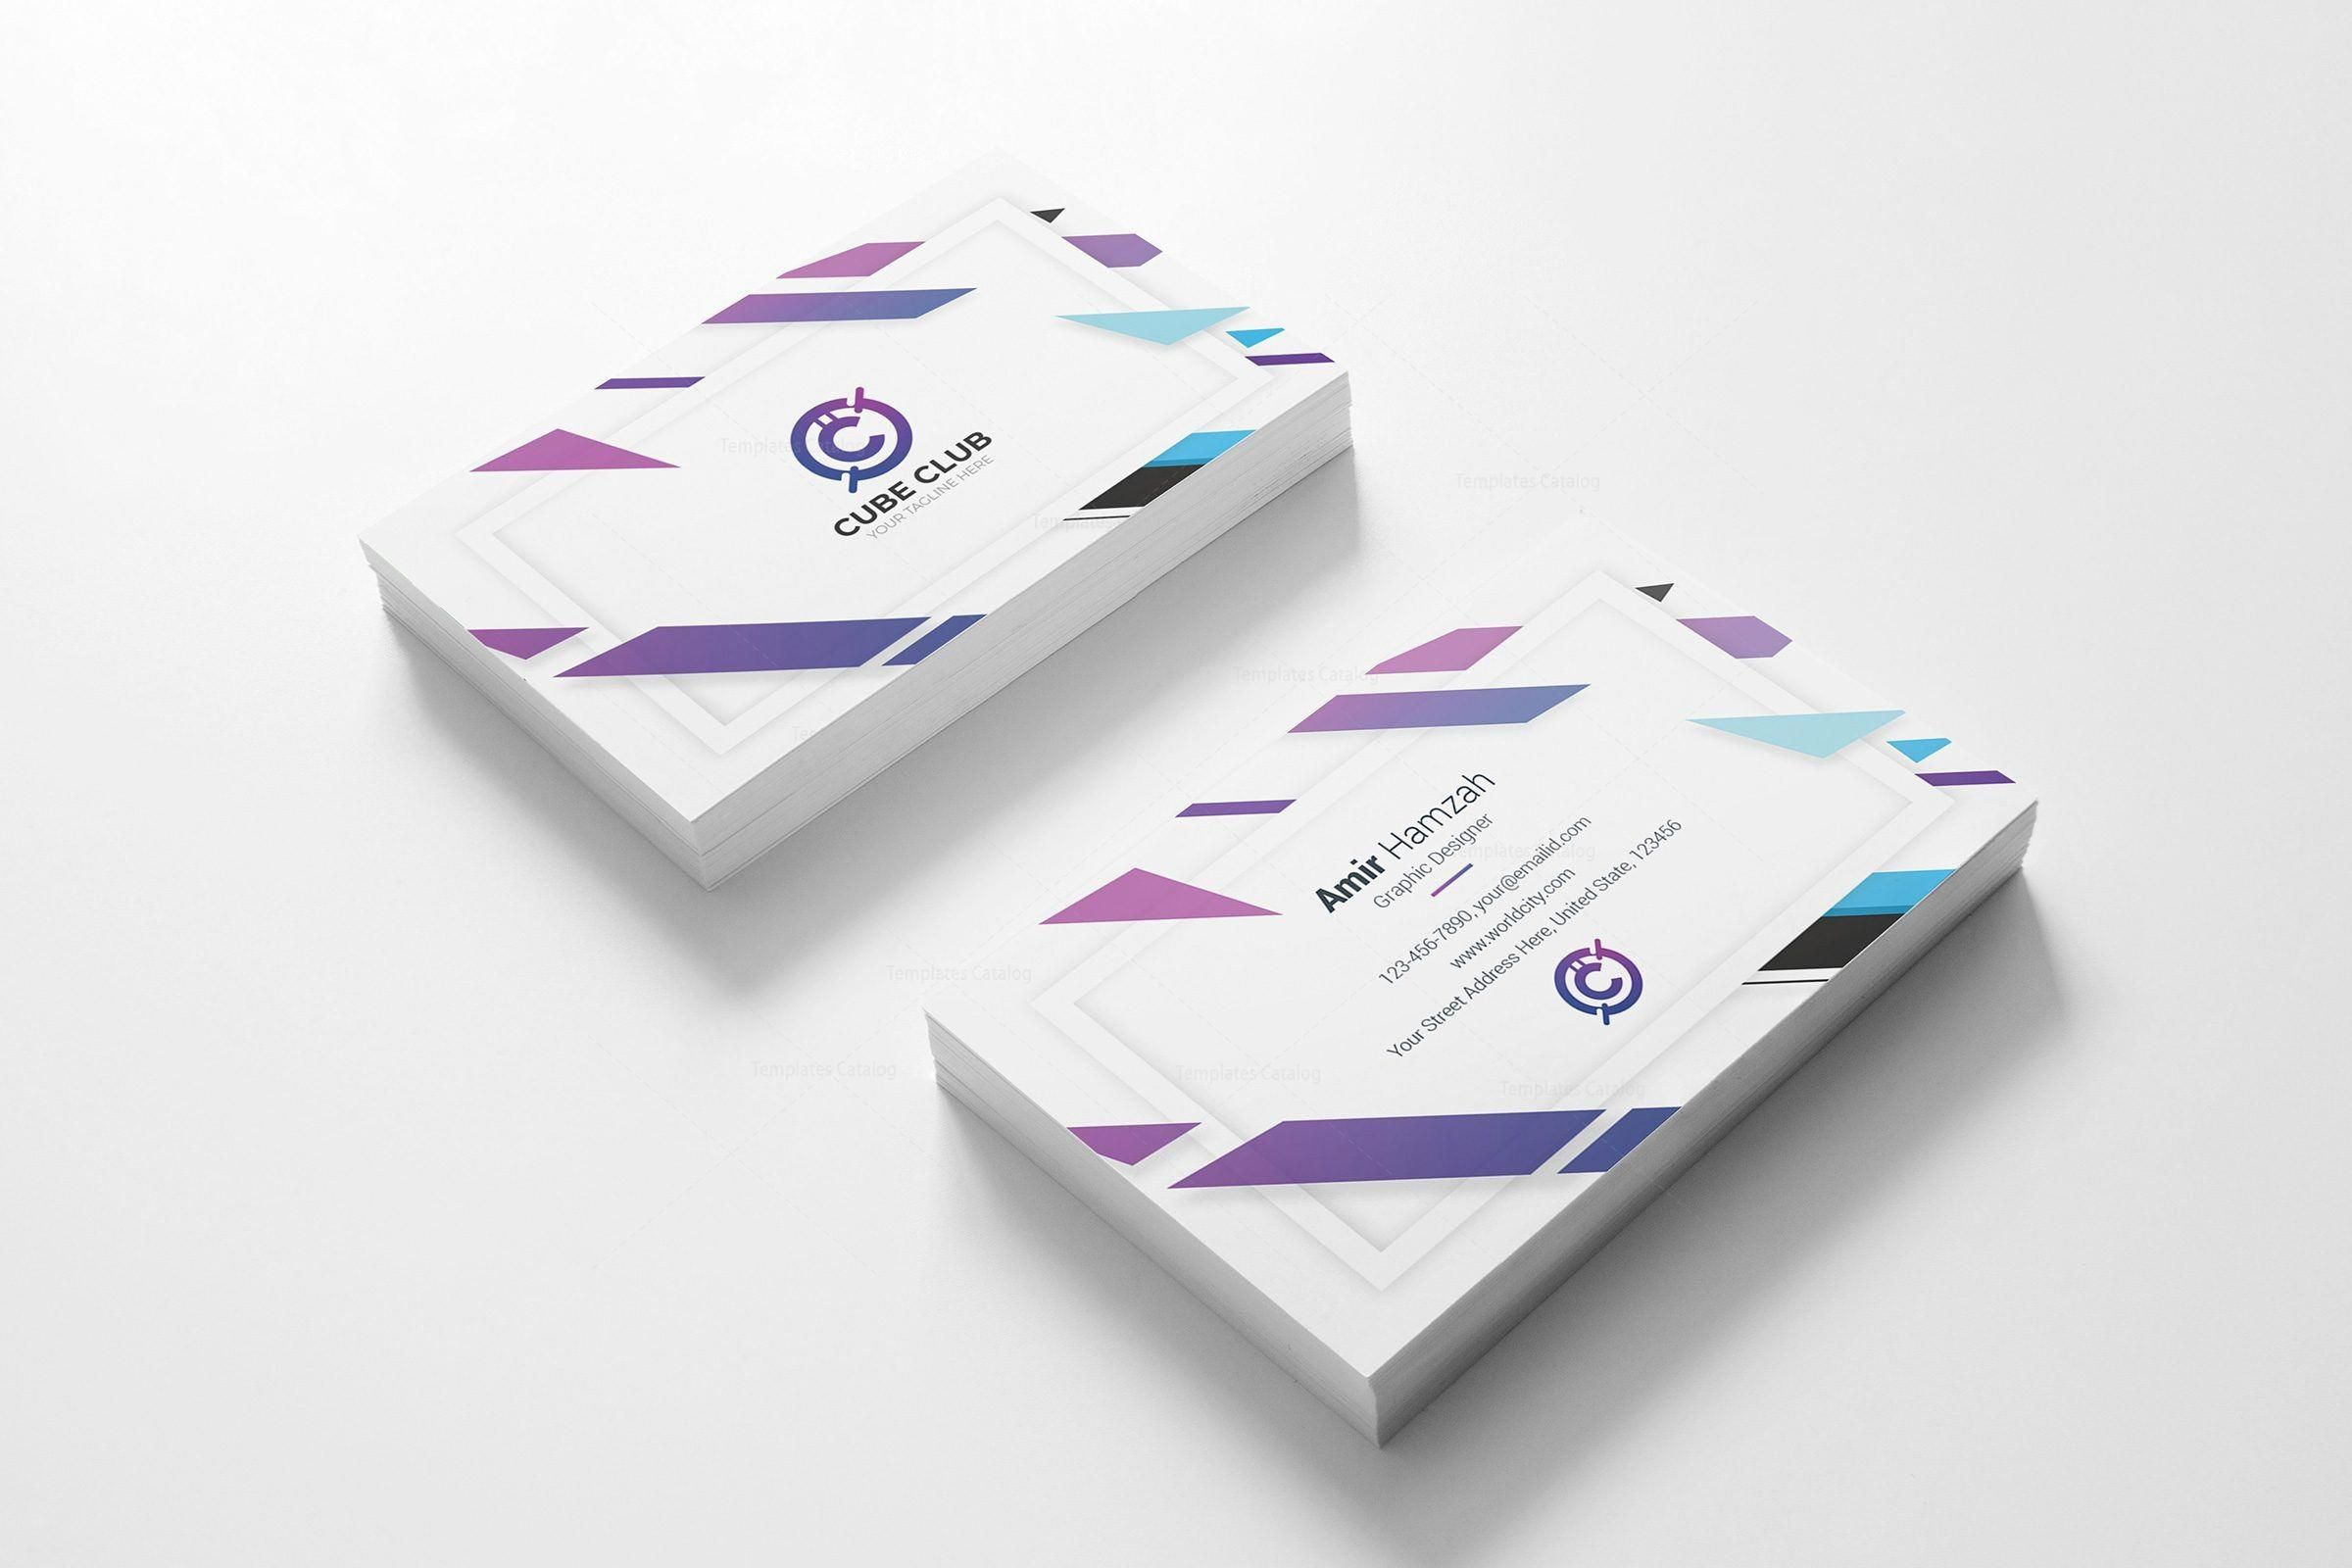 Cube Club Business Card Design Template Graphic Yard Graphic Templates Store Business Card Design Modern Business Cards Design Card Design